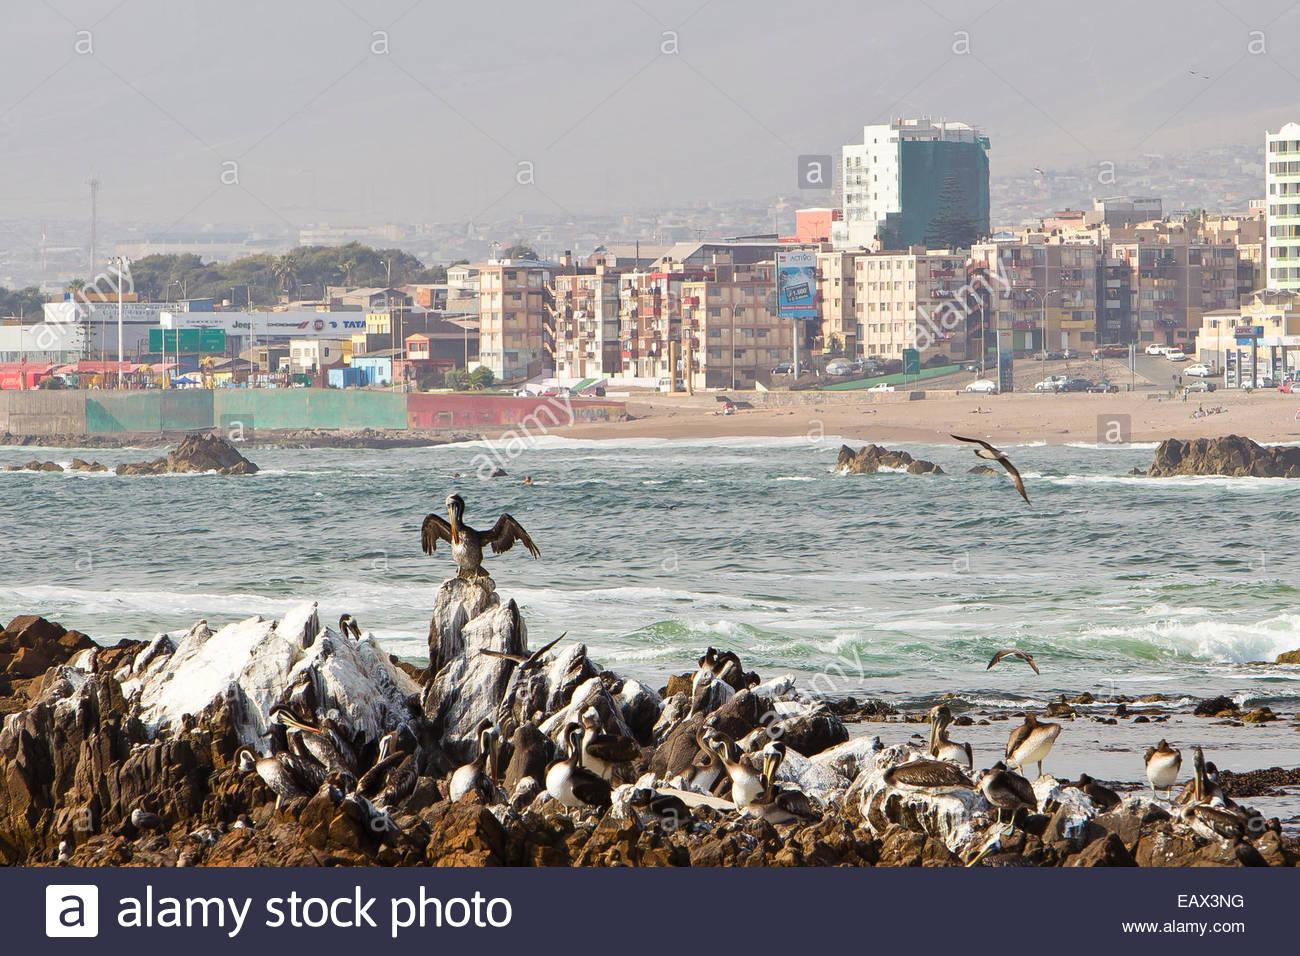 Pelicans alight on guano covered rocks near Antofagasta's urbanized coastline. - Stock Image